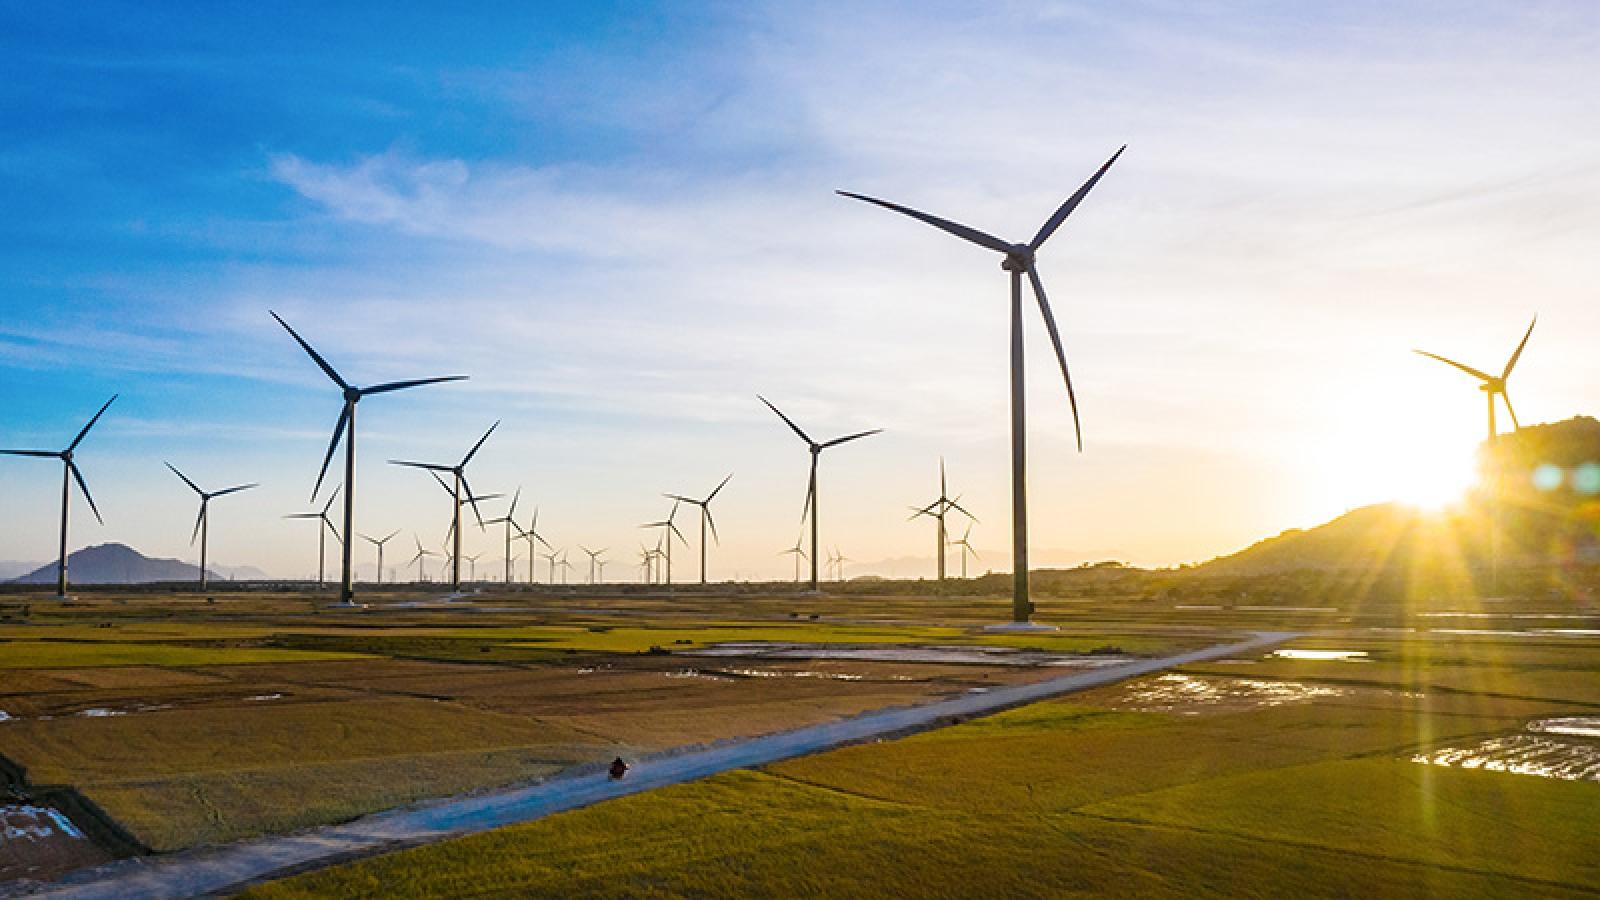 AC Energy, BIM Group initiate US$155 million local wind farm project in Vietnam